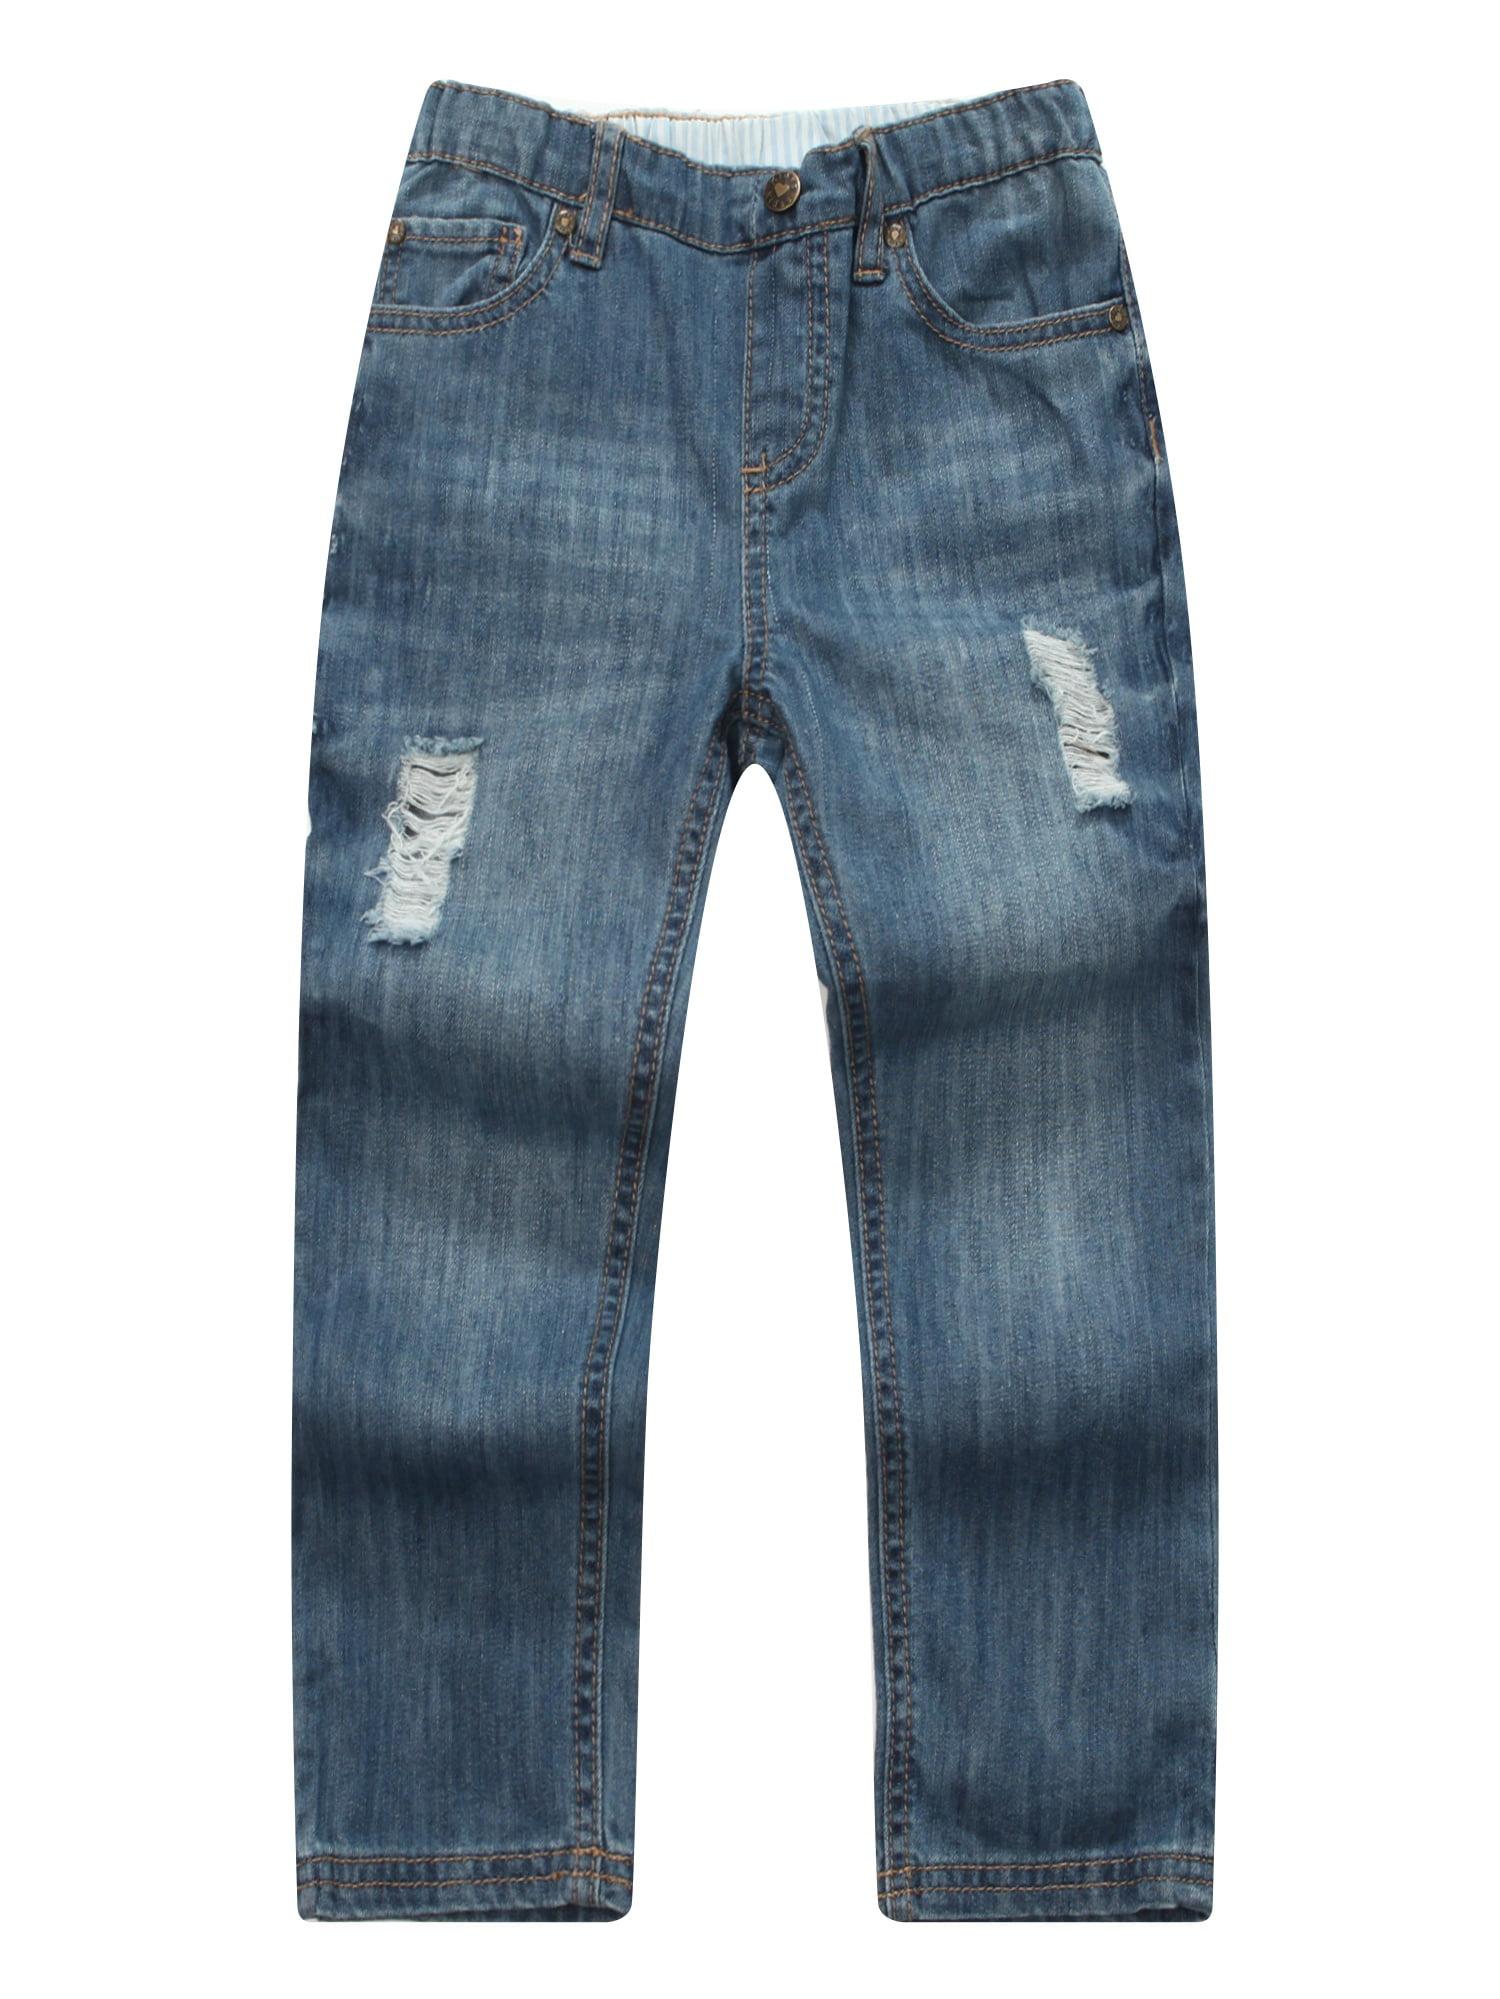 Richie House Little Girls Light Blue Ripped Elastic Waistband Denim Pants 2-7